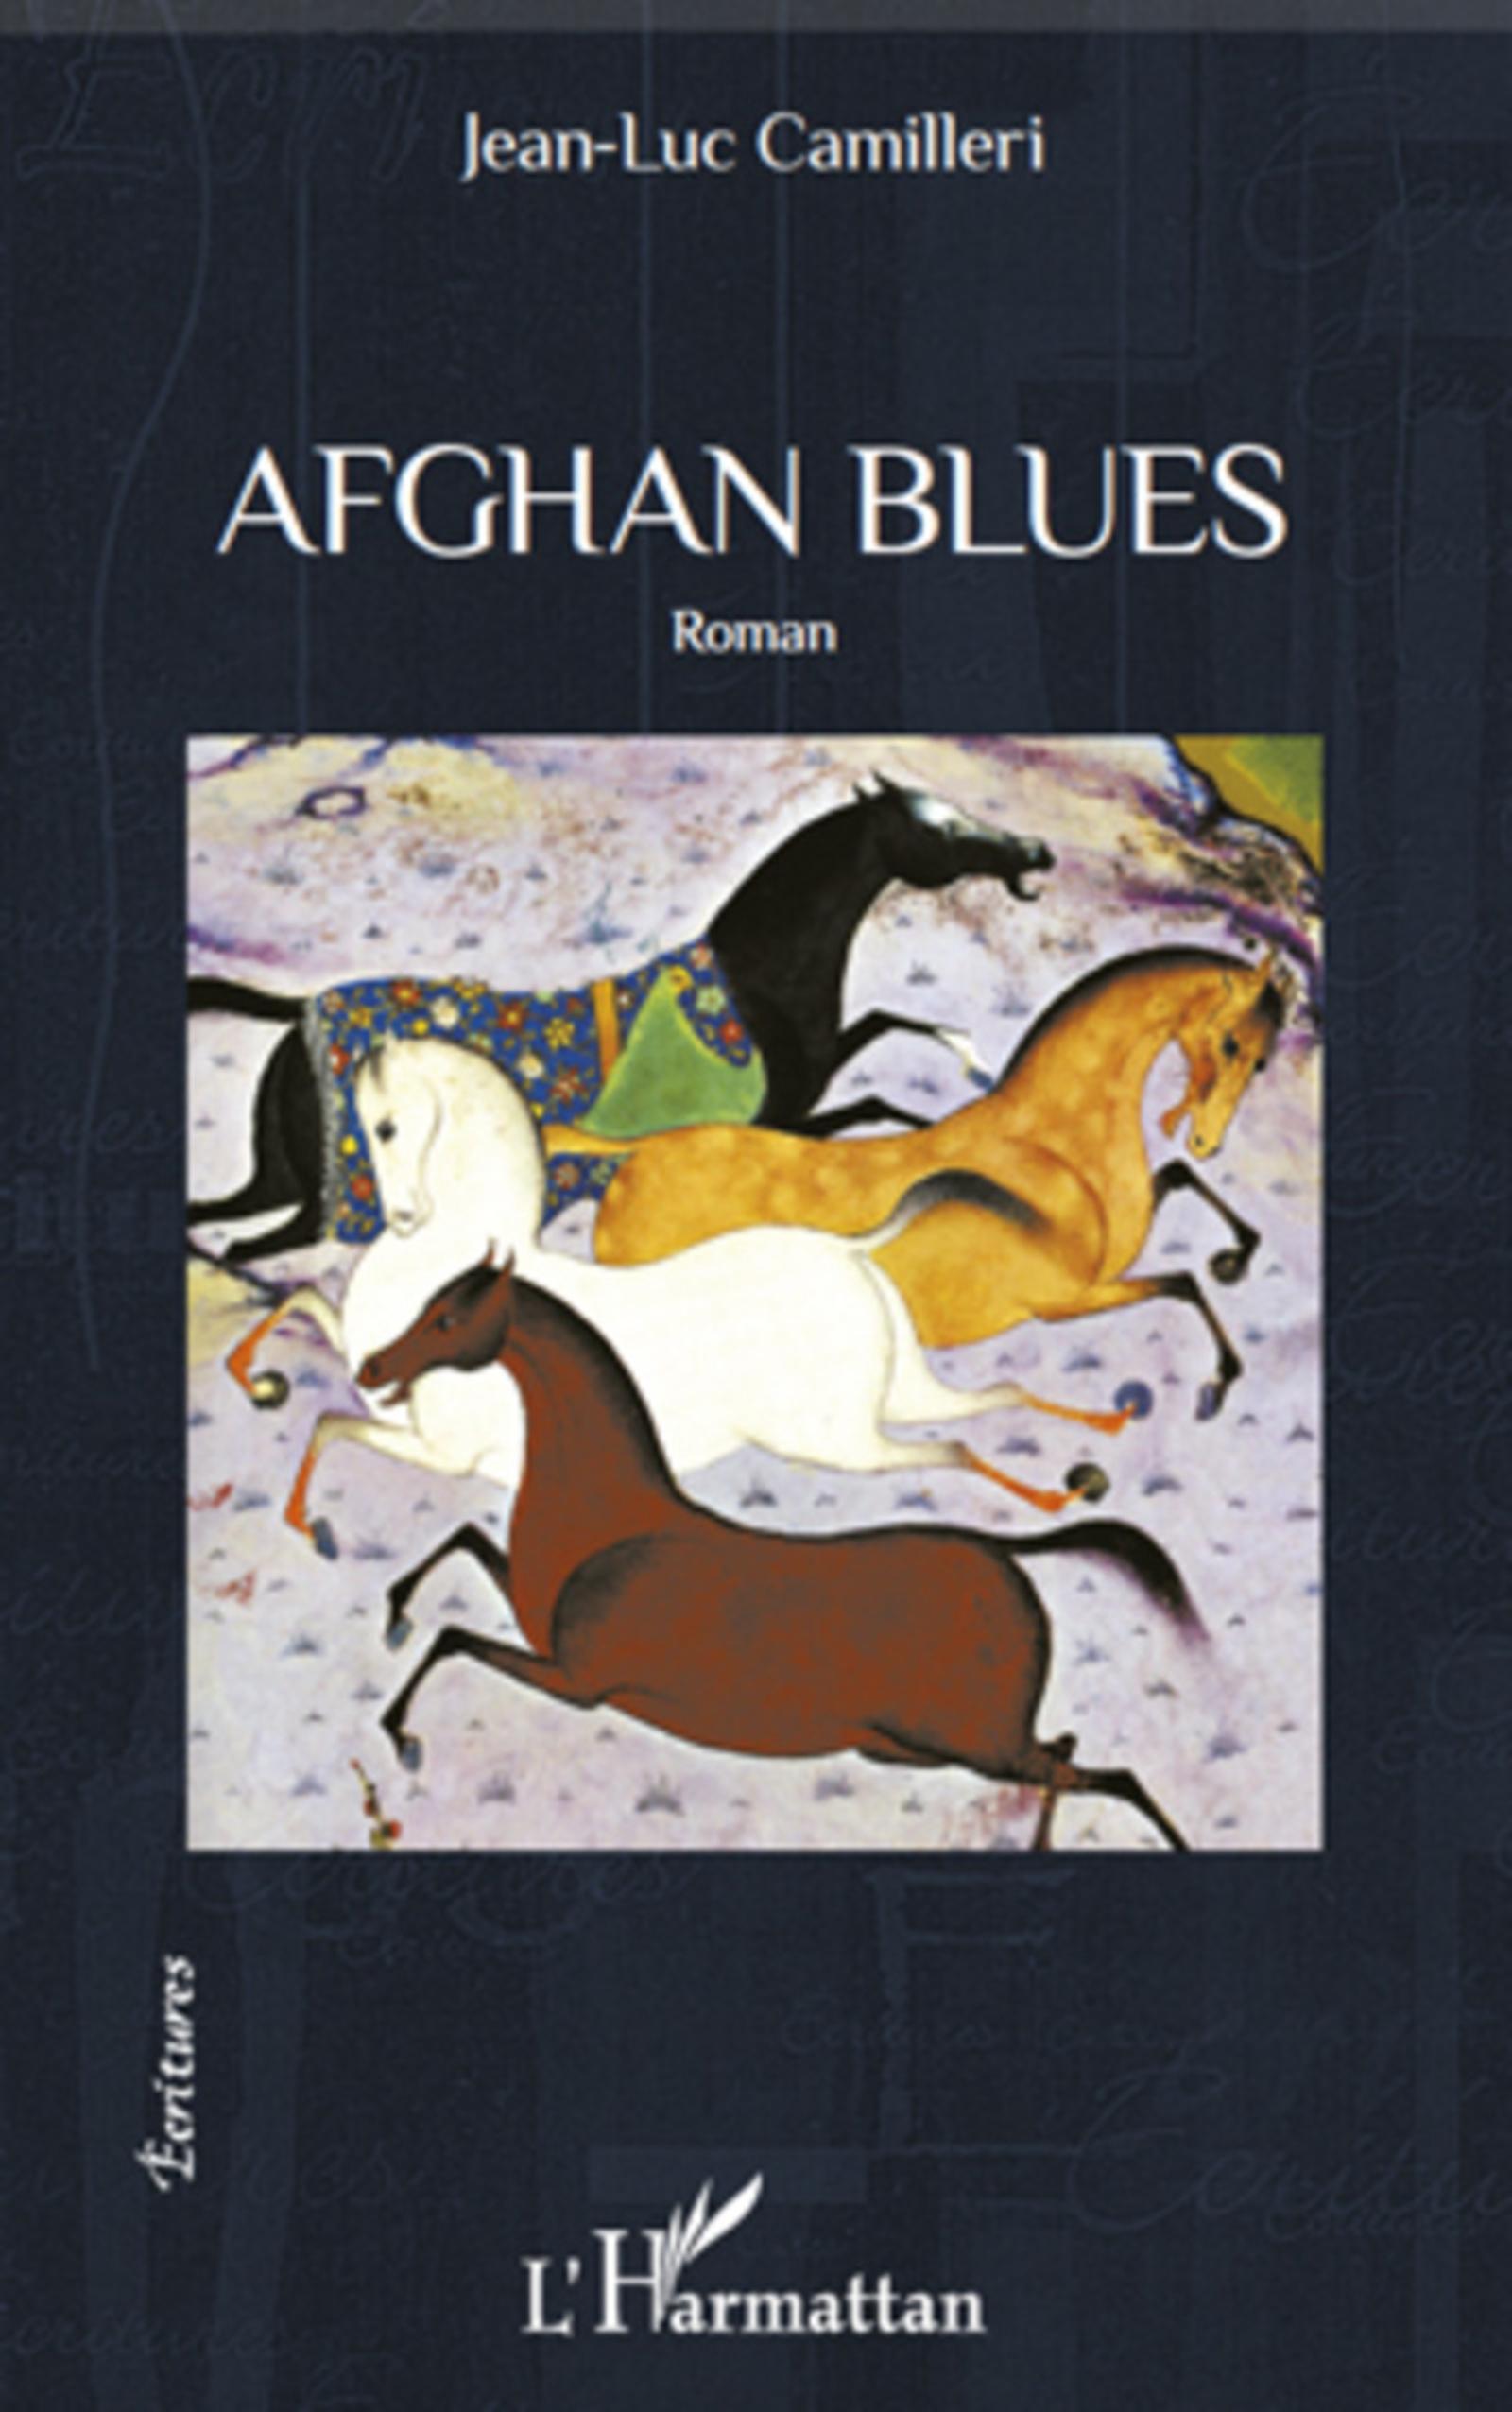 Afghan blues